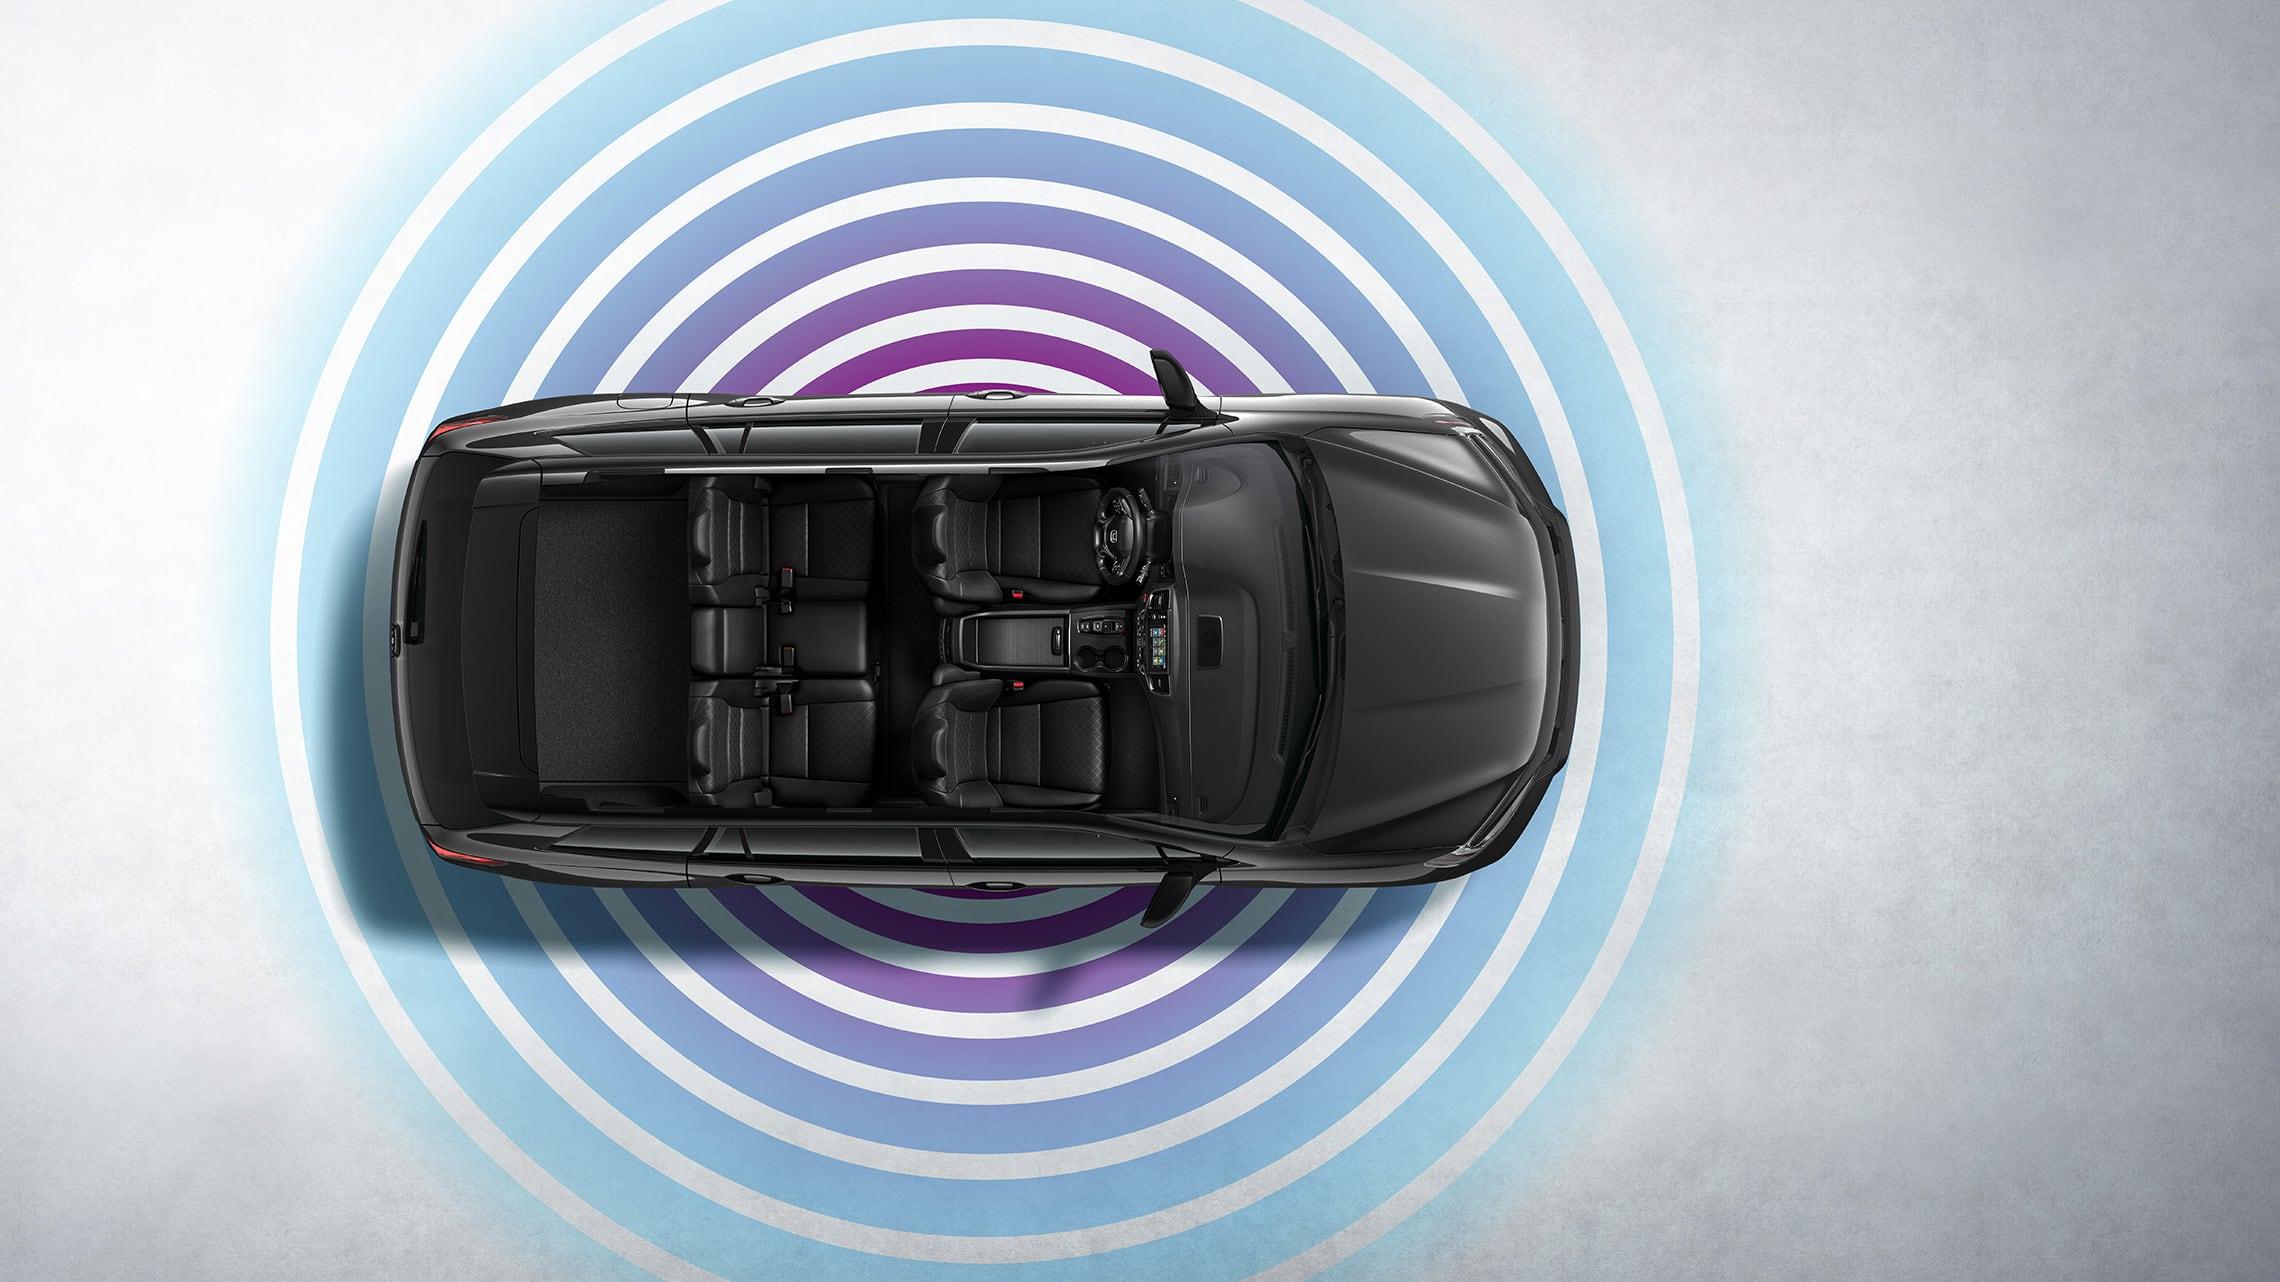 Vista aérea de la Honda Passport Elite2020 en Modern Steel Metallic que muestra la característica de zona interactiva wifi.